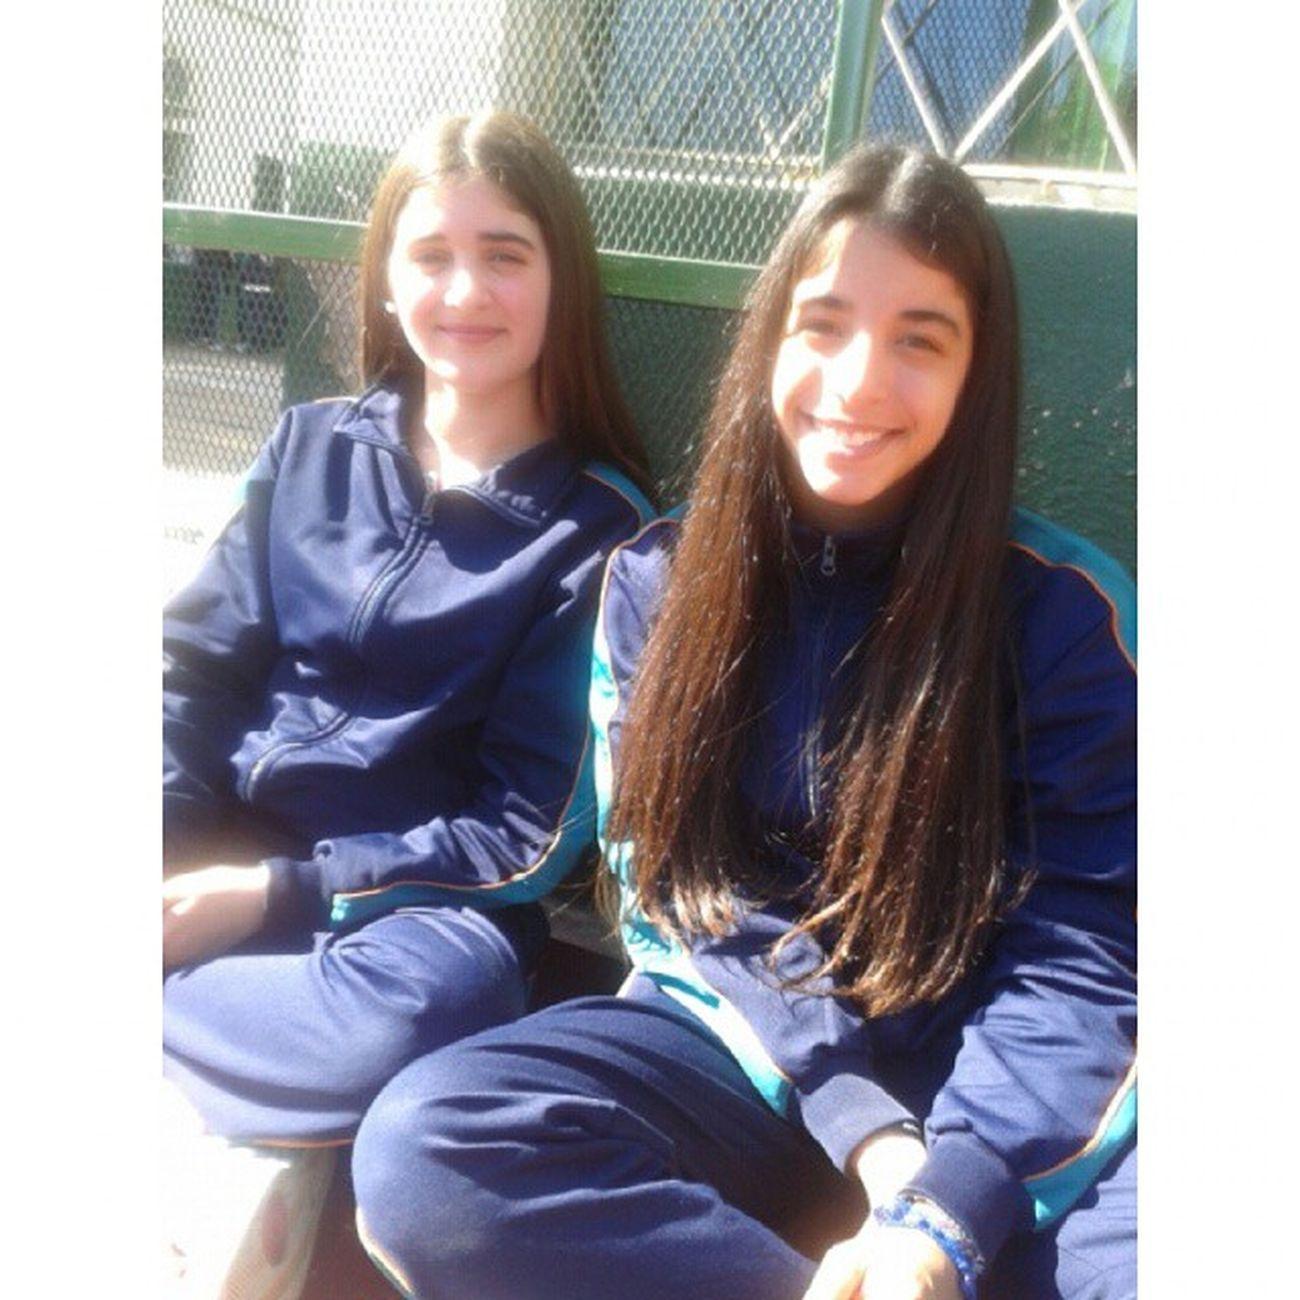 Hi Photo Highschool Cq me with friend Tati goodday instalike goodfriend cute loveyou like4like sunday greatday